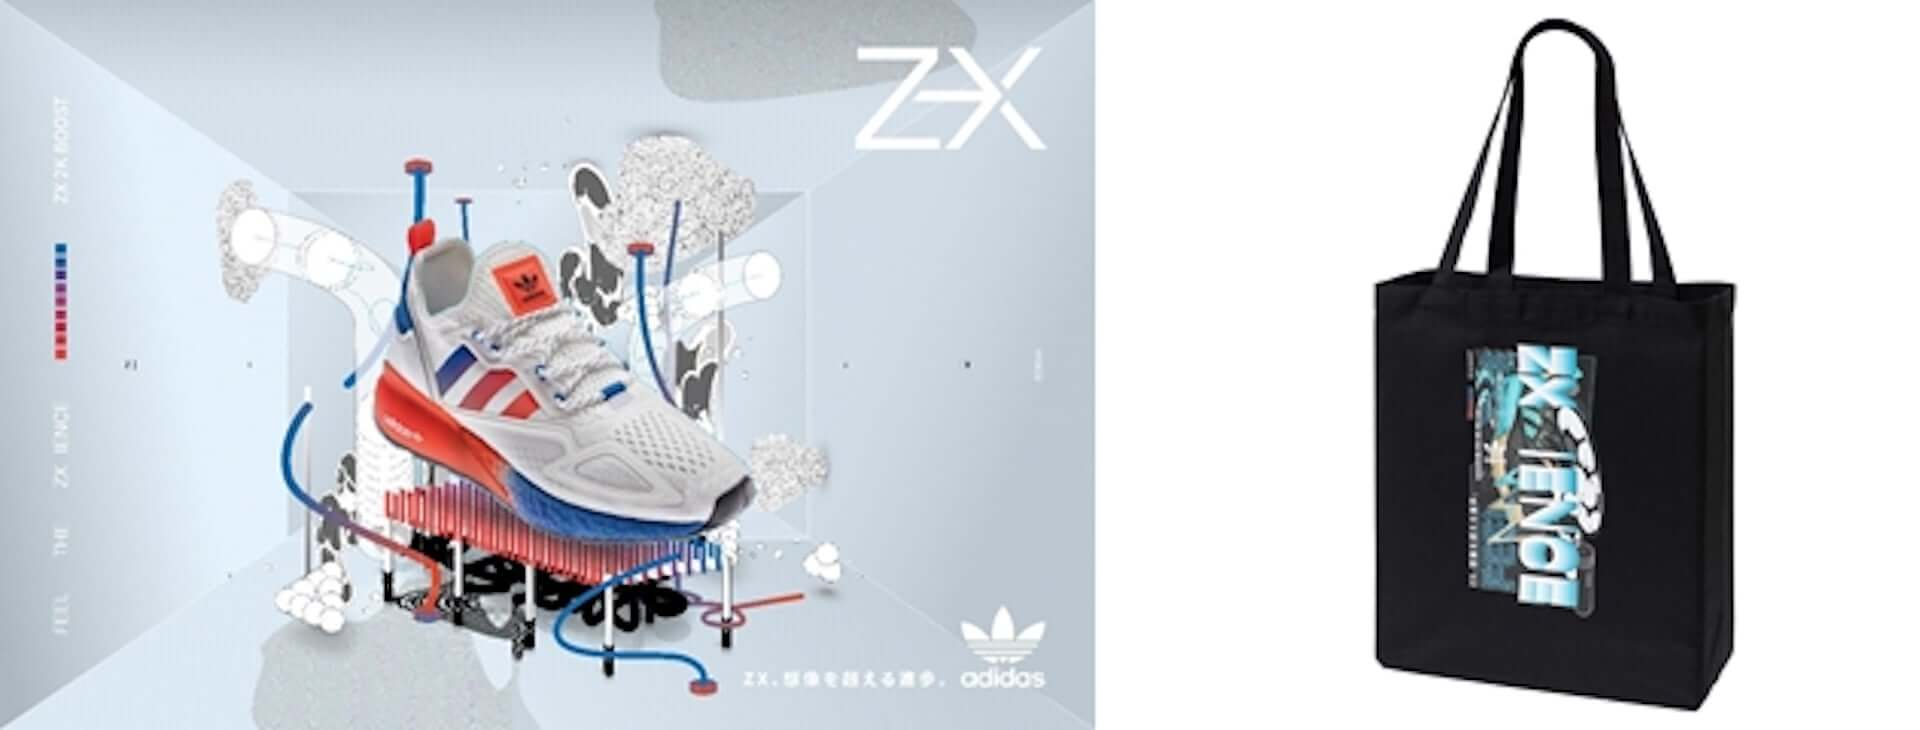 adidas Originalsの「ZX」シリーズから最新モデル『ZX 2K BOOST』が登場!レイザーラモンRG、アントニー出演のIGライブも開催決定 lf200817_adidas-zx_3-1920x730